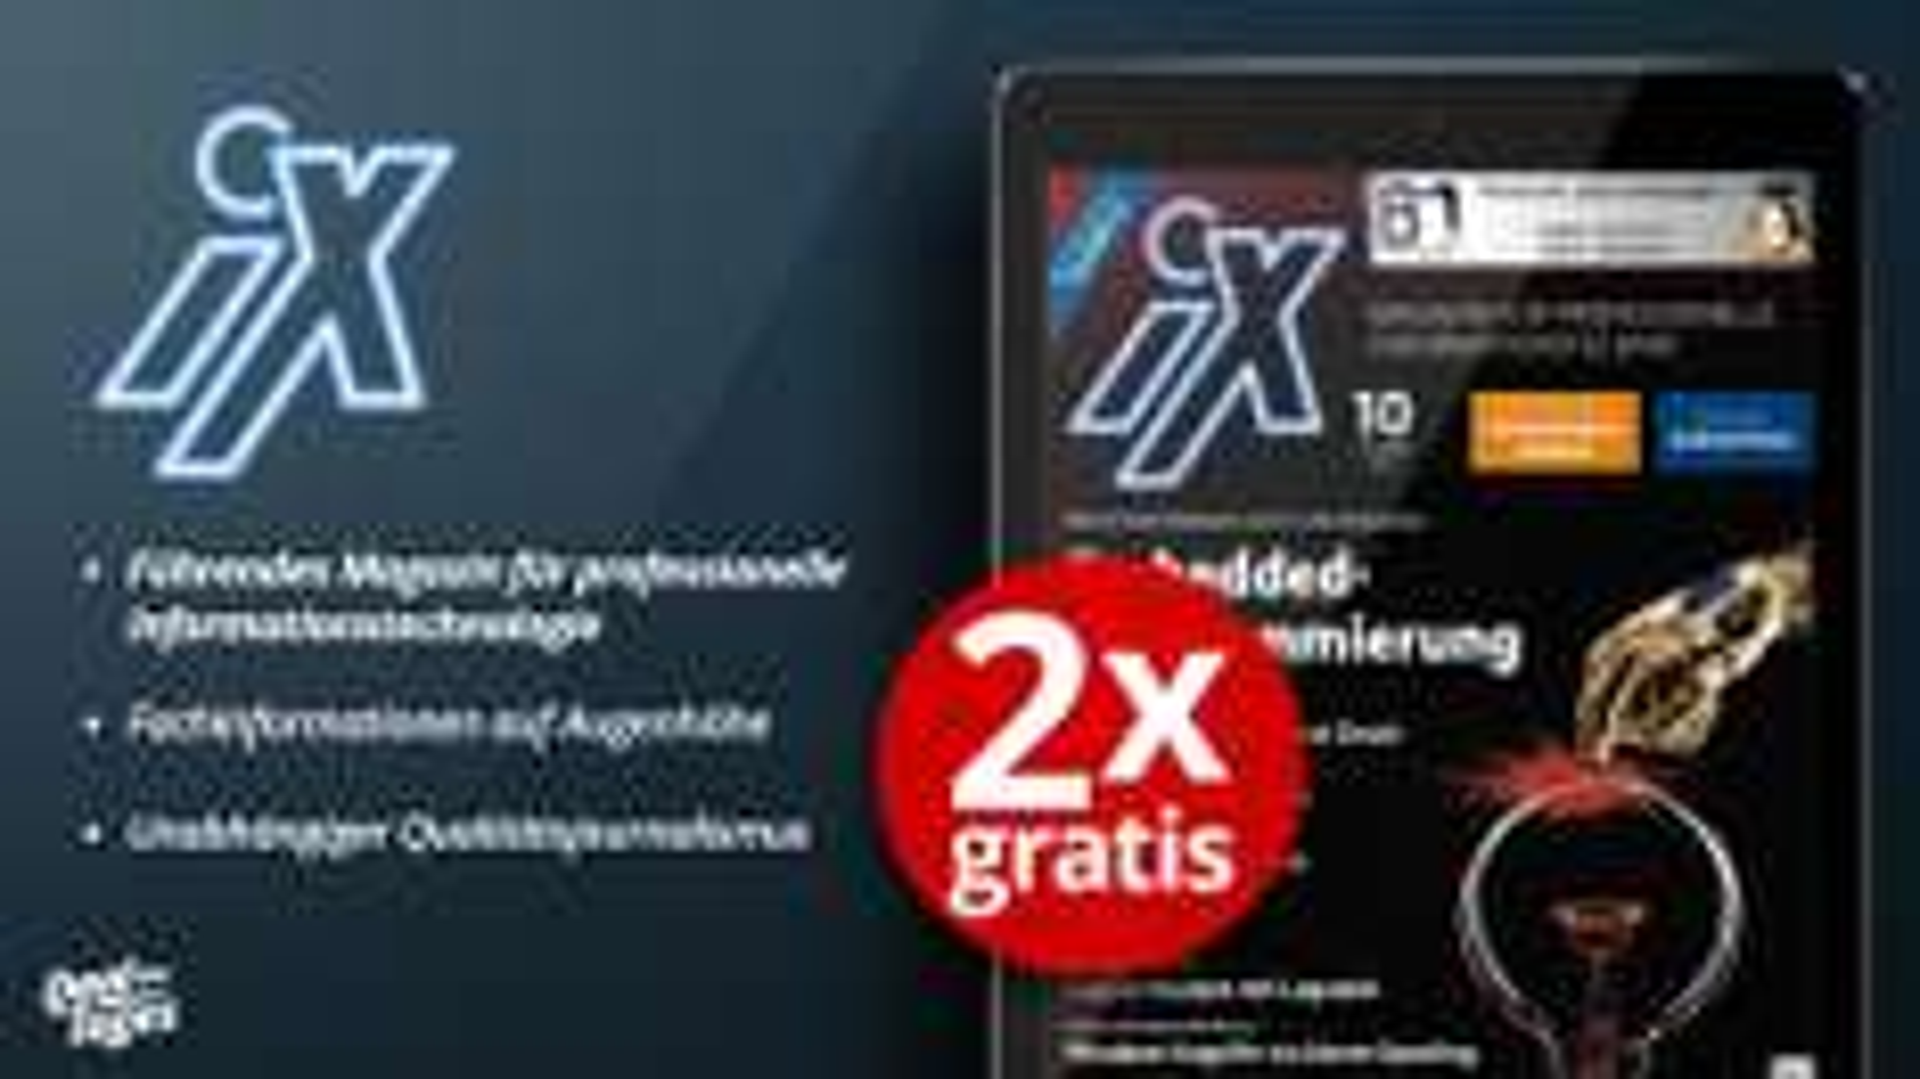 (epaper) 2 Ausgaben iX Digital Gratis. Kündigung notwendig